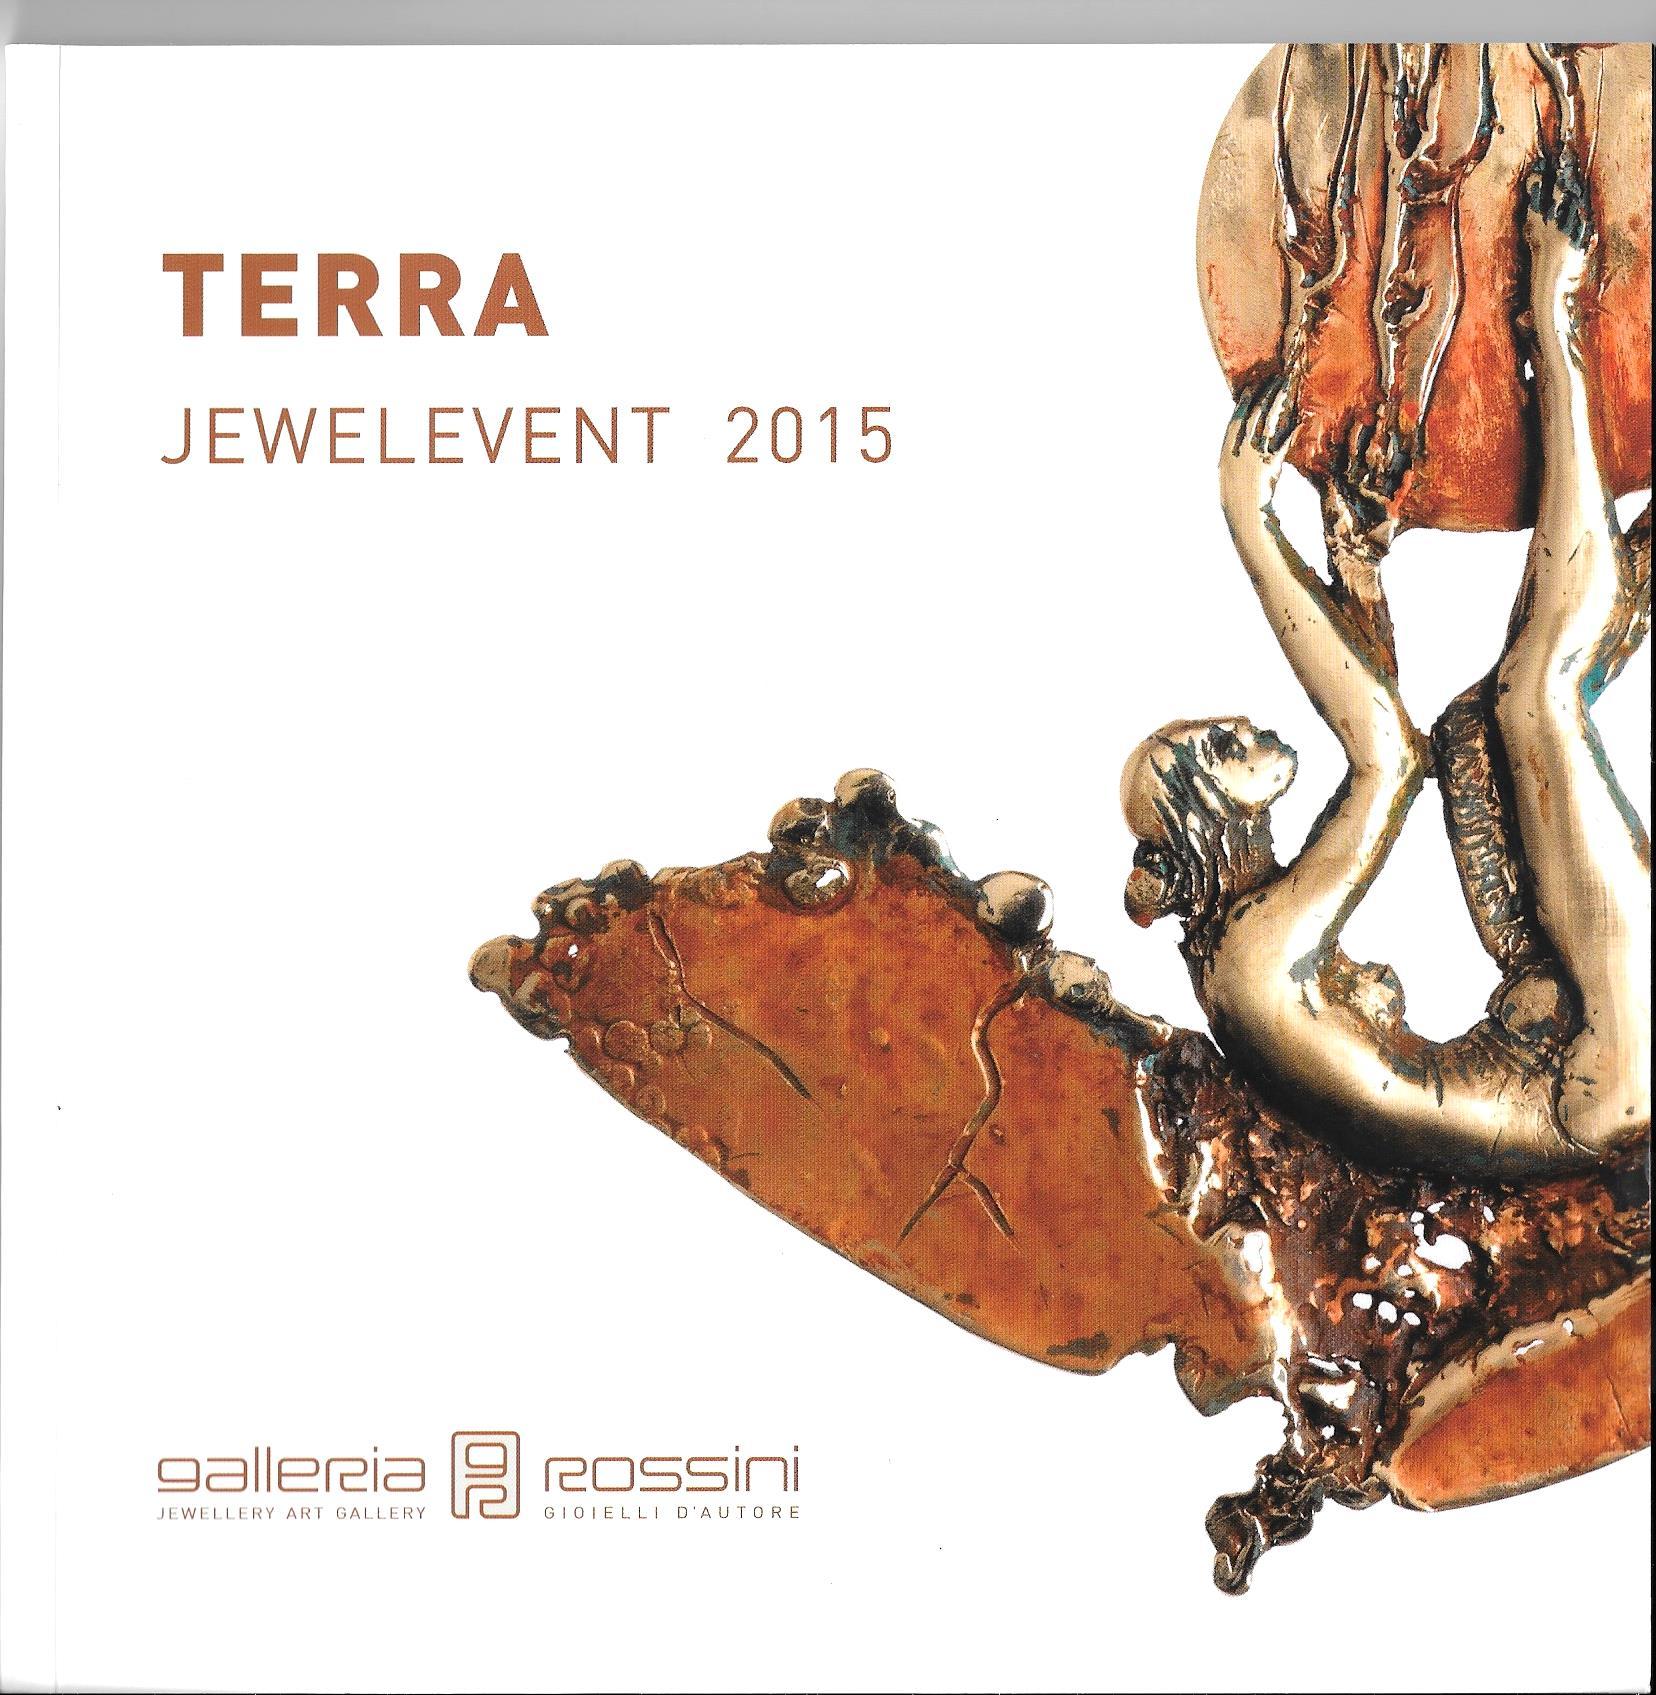 Jewelevent 2015 – Terra – Galleria Rossini Milano